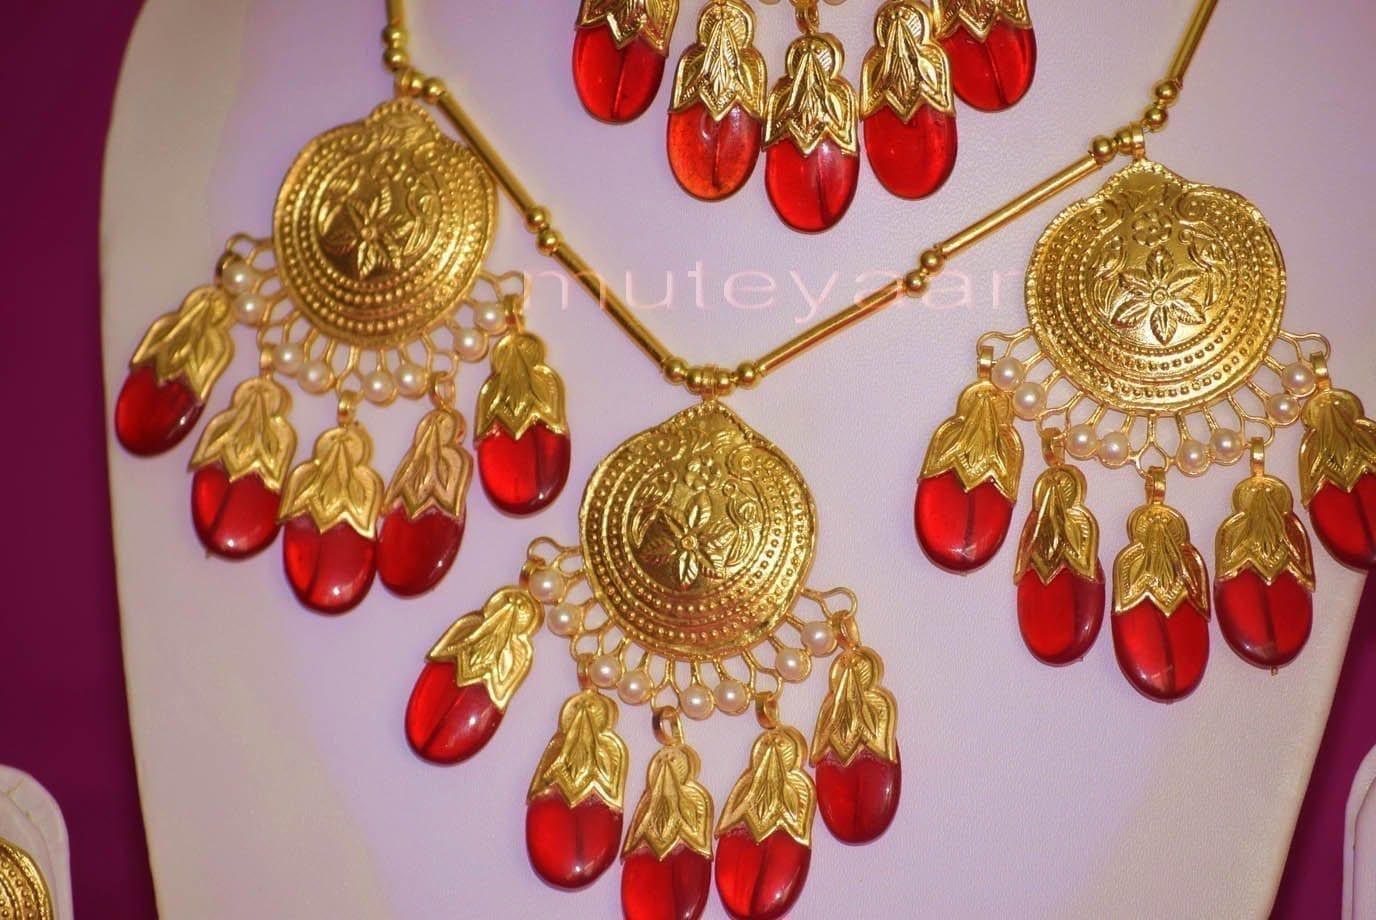 24 Ct. Gold Plated Traditional Punjabi Full Dakh Set jewellery with Tikka  J0209 2